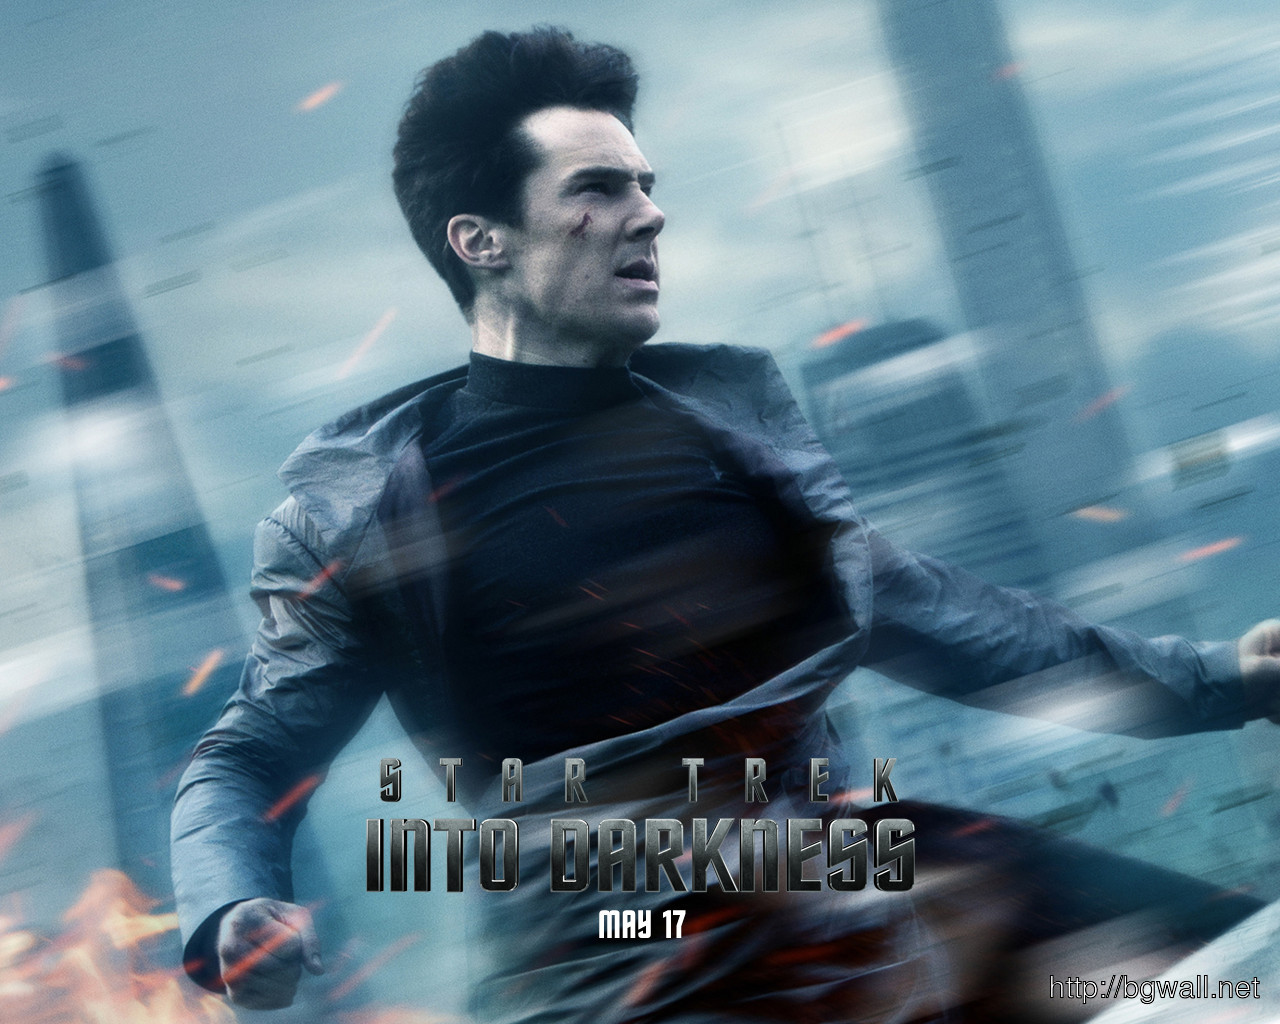 Benedict Cumberbatch In Star Trek Into Darkness Wallpaper